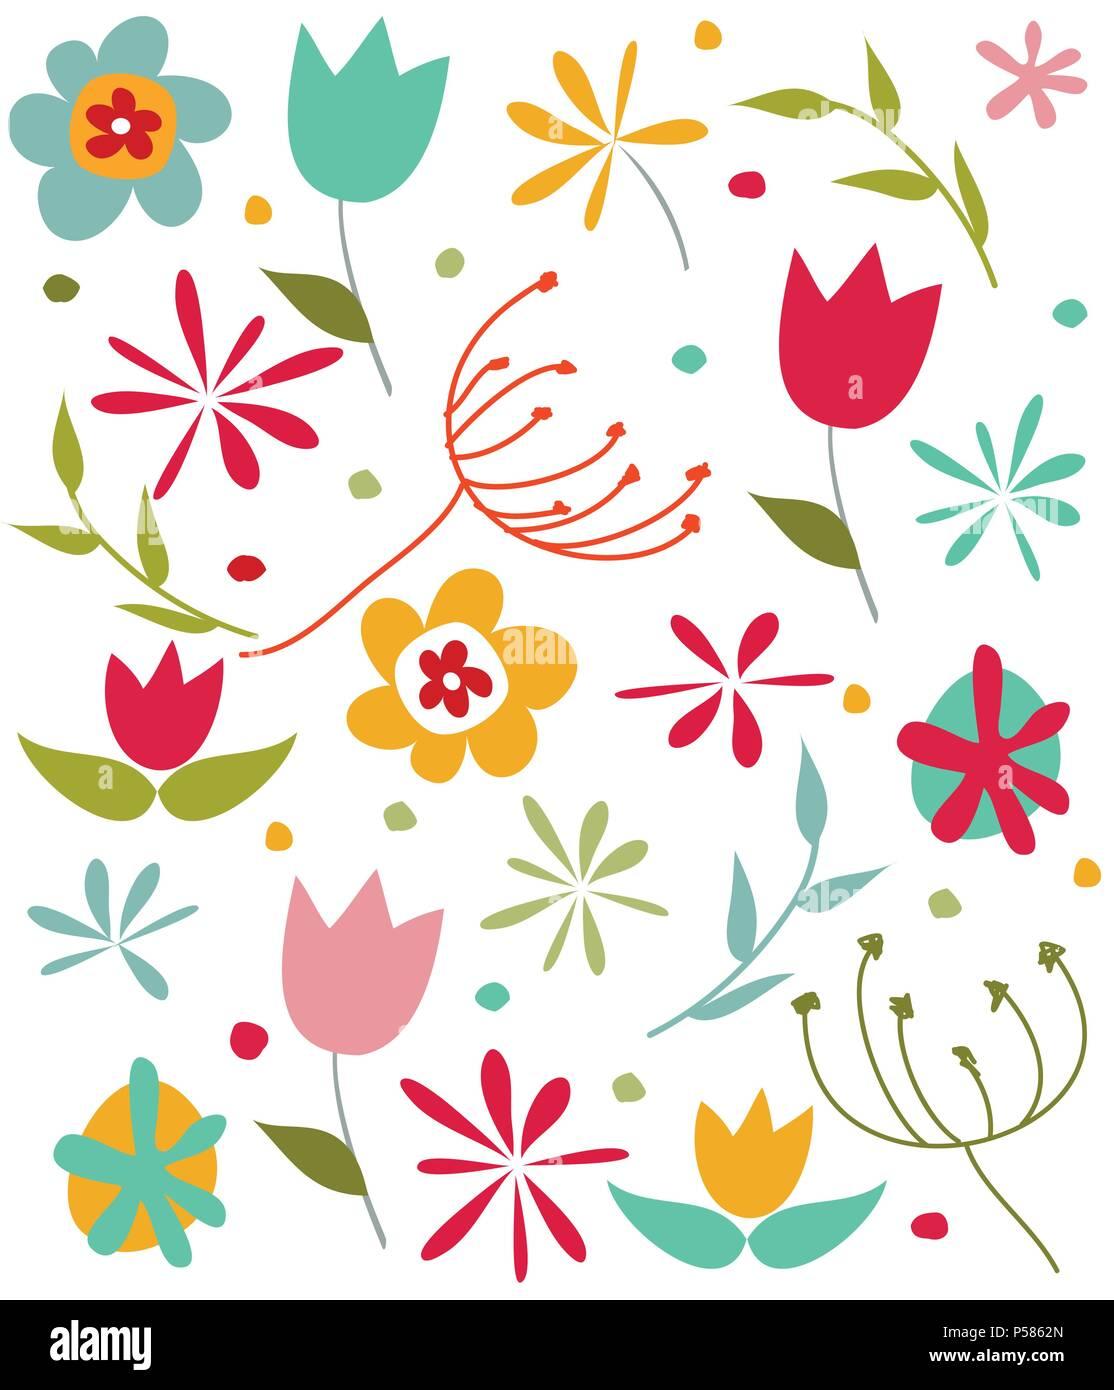 Hand Painted Fabric Imágenes De Stock & Hand Painted Fabric Fotos De ...